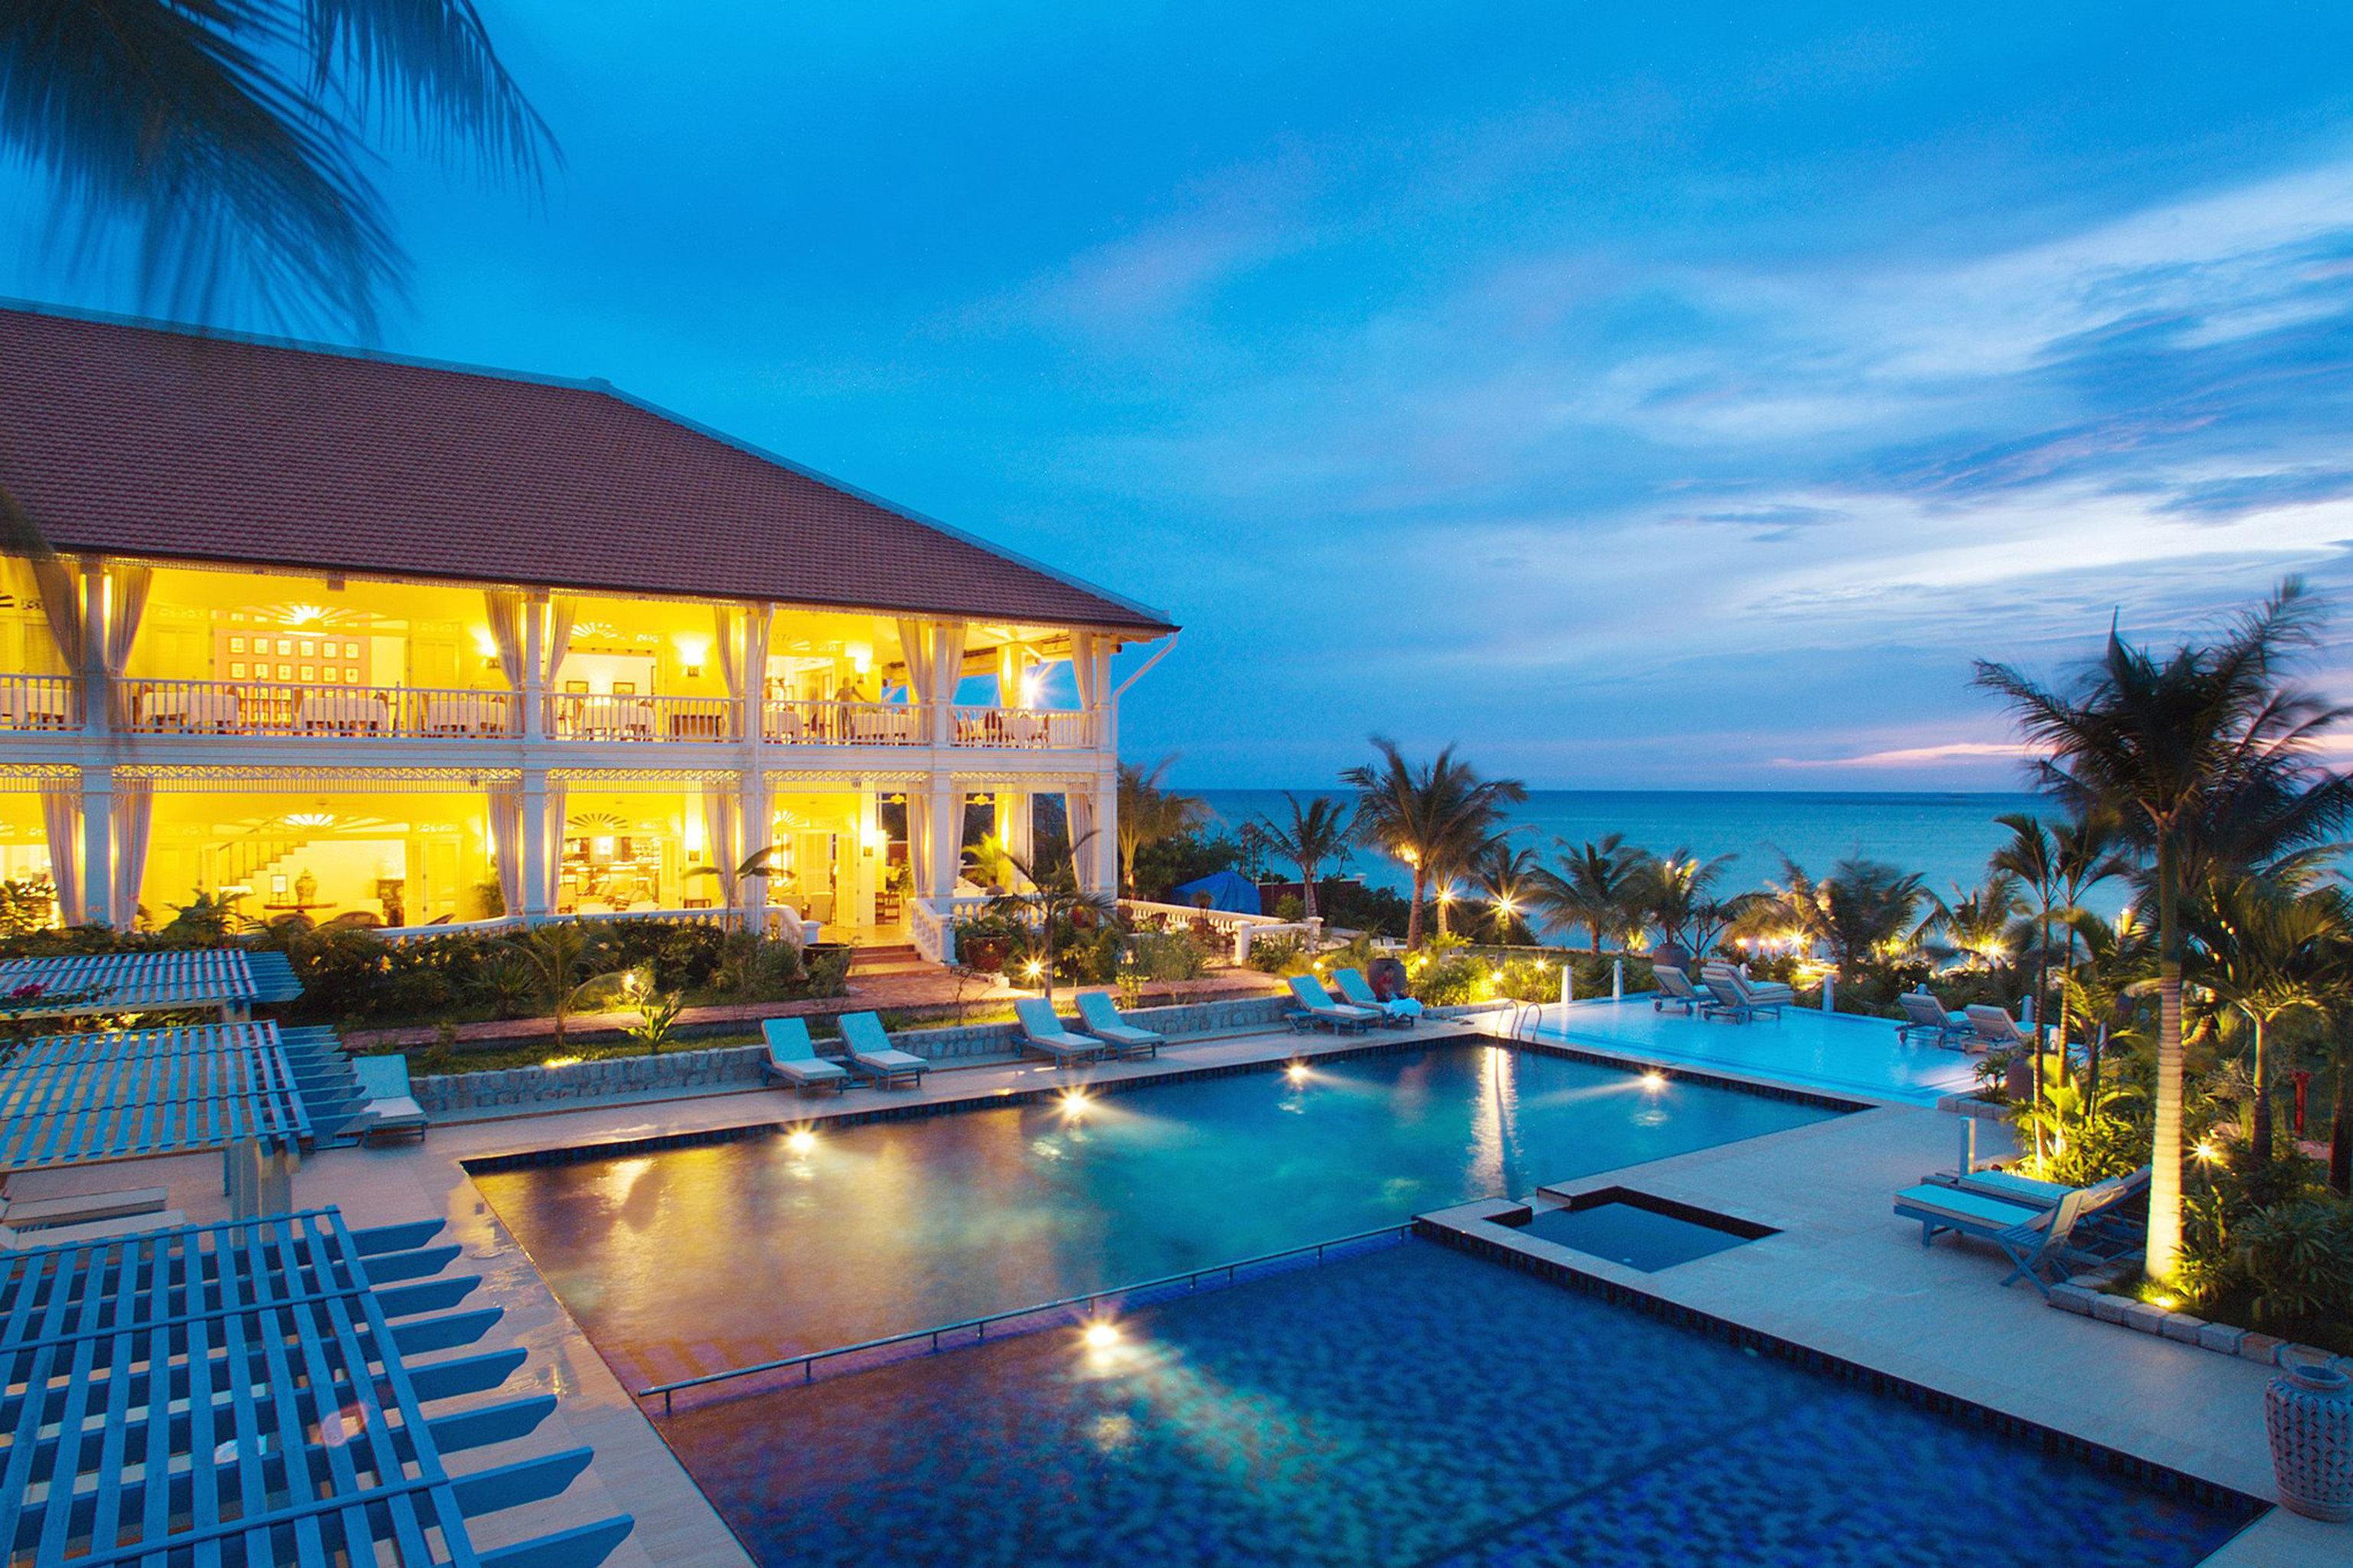 Beachfront Island Patio Pool Resort Romantic Waterfront sky swimming pool property leisure resort town Villa caribbean lined